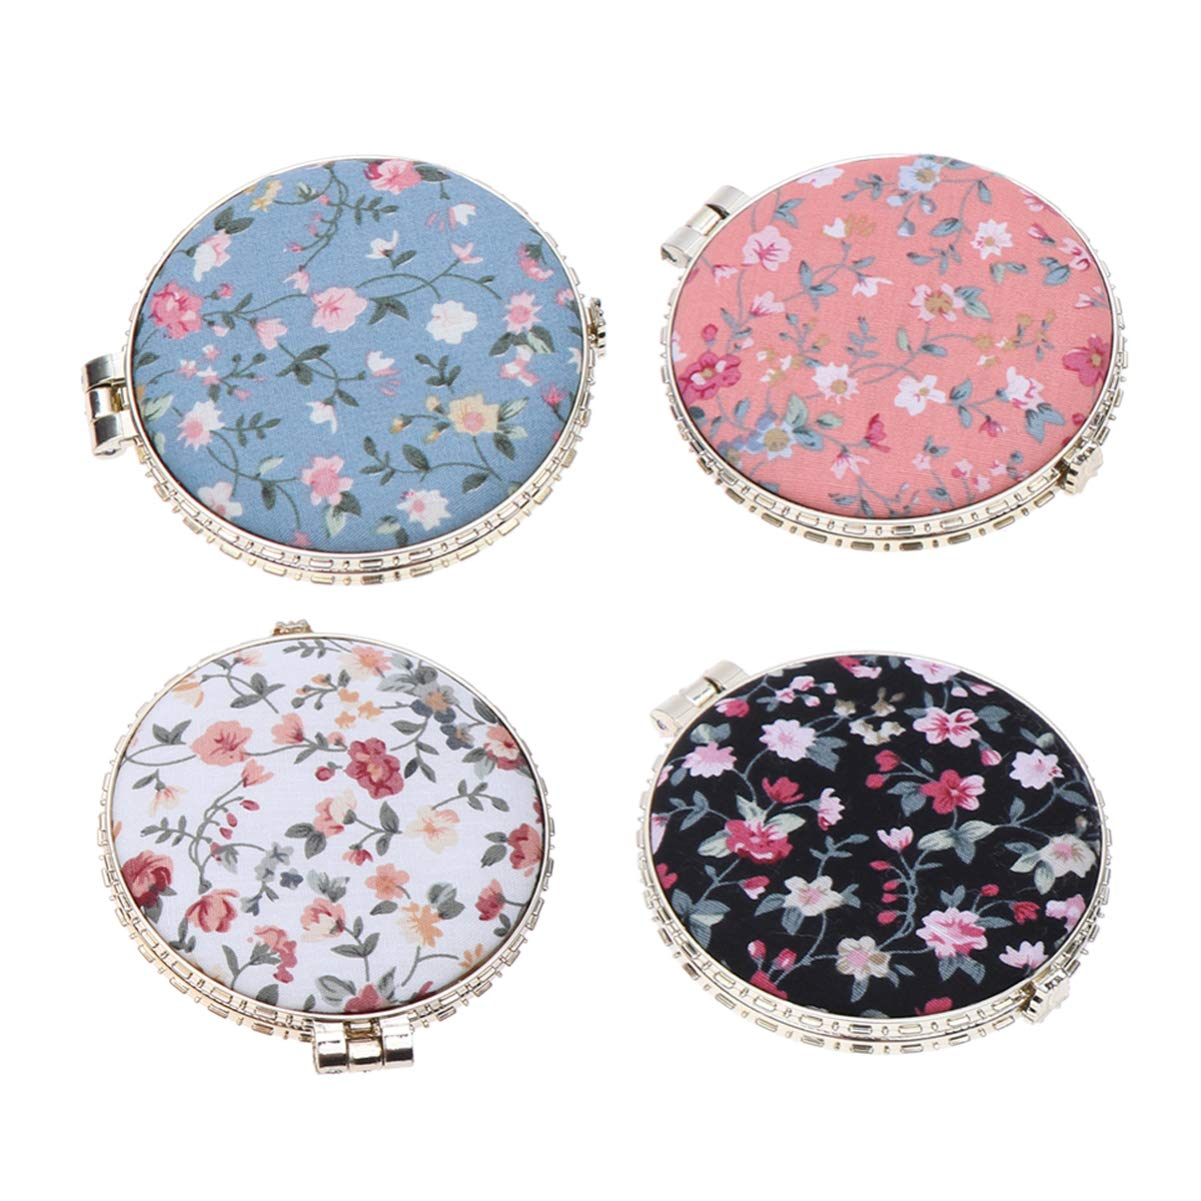 LEORX 4pcs Pocket Mirror Free Shipping Cheap Bargain Gift Vintage Do Japan Maker New Floral Round Foldable